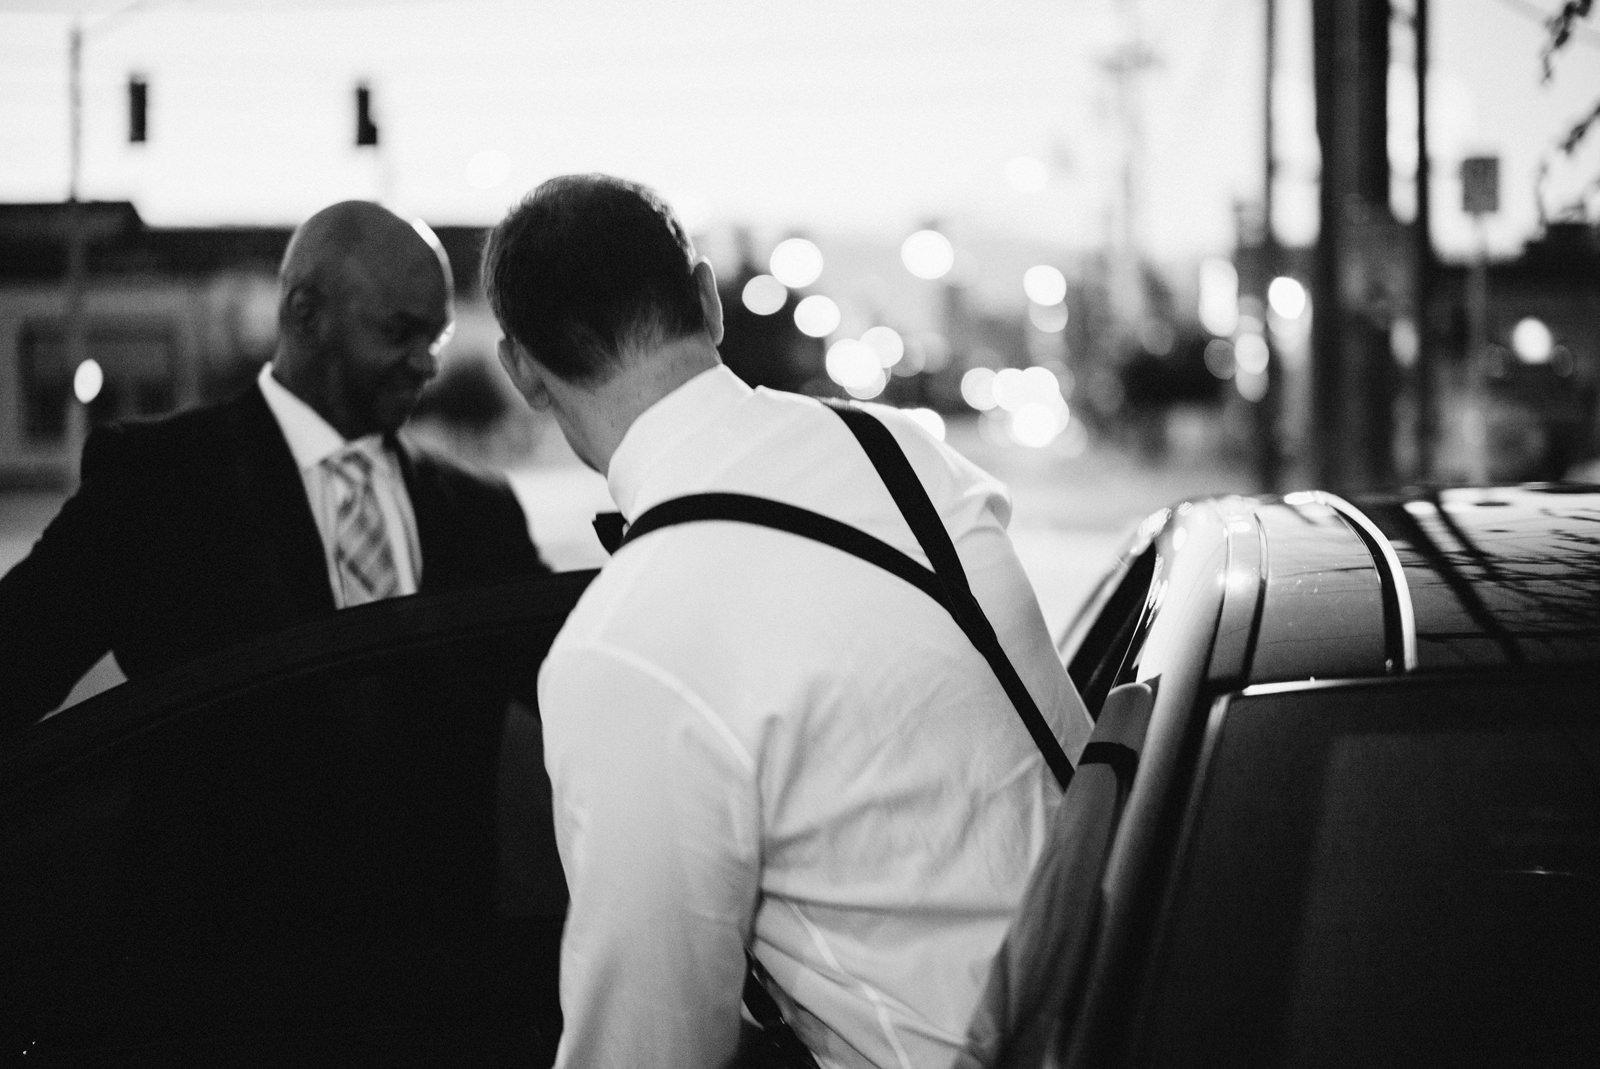 sodo-park-wedding-098 SODO PARK WEDDING